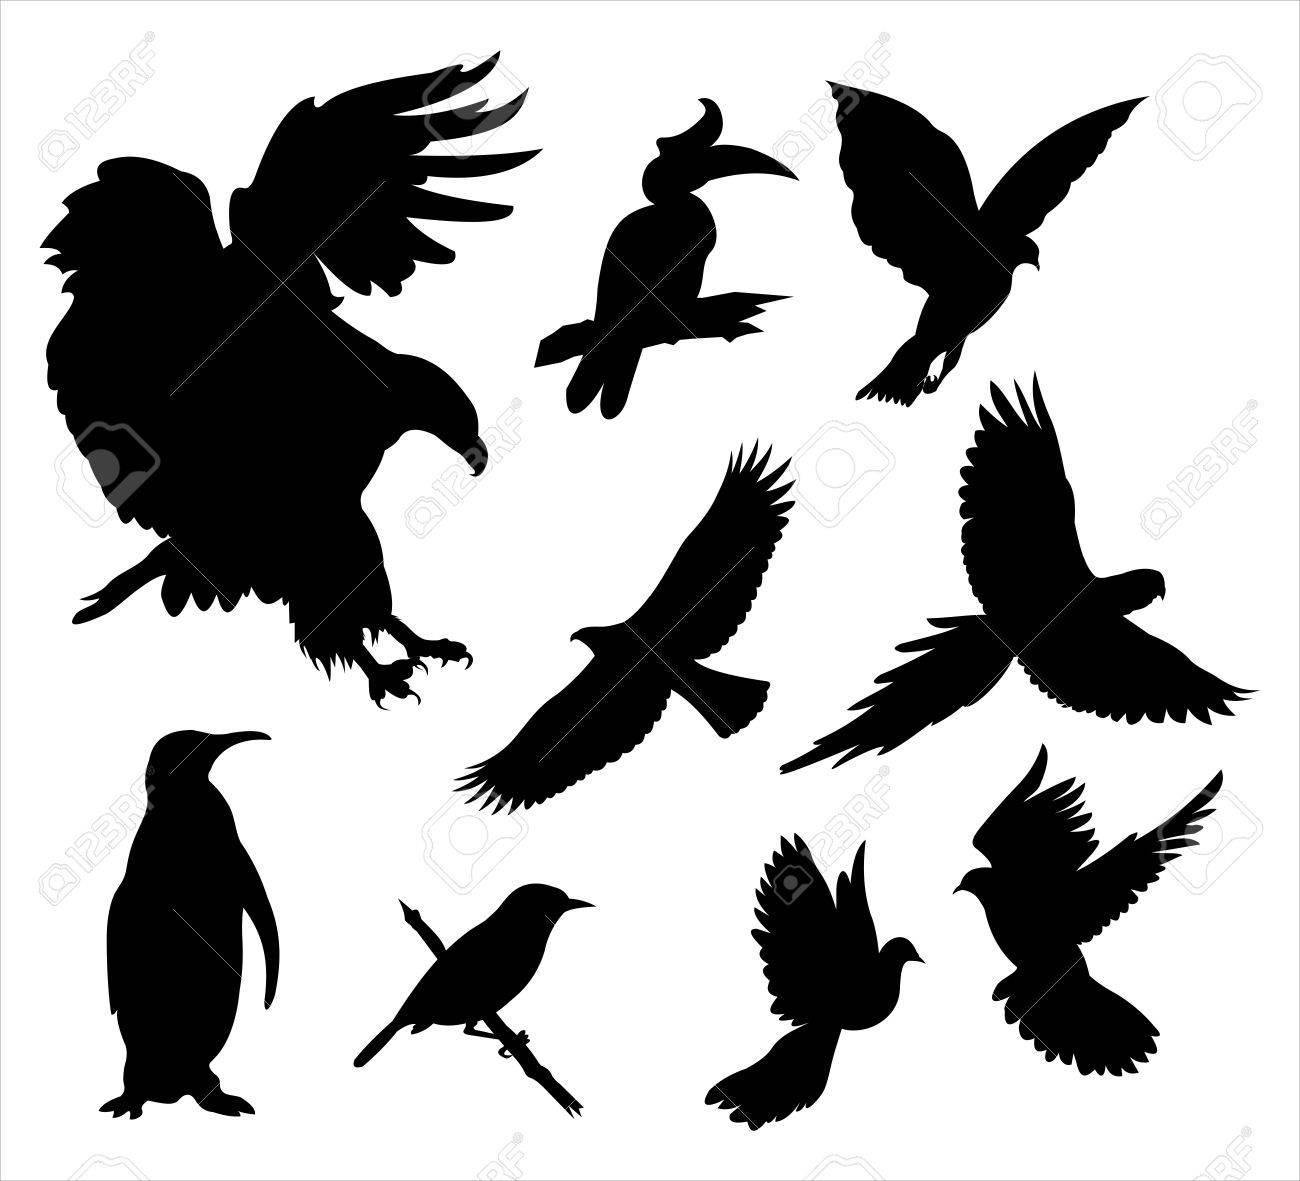 Bird silhouette - 10675946